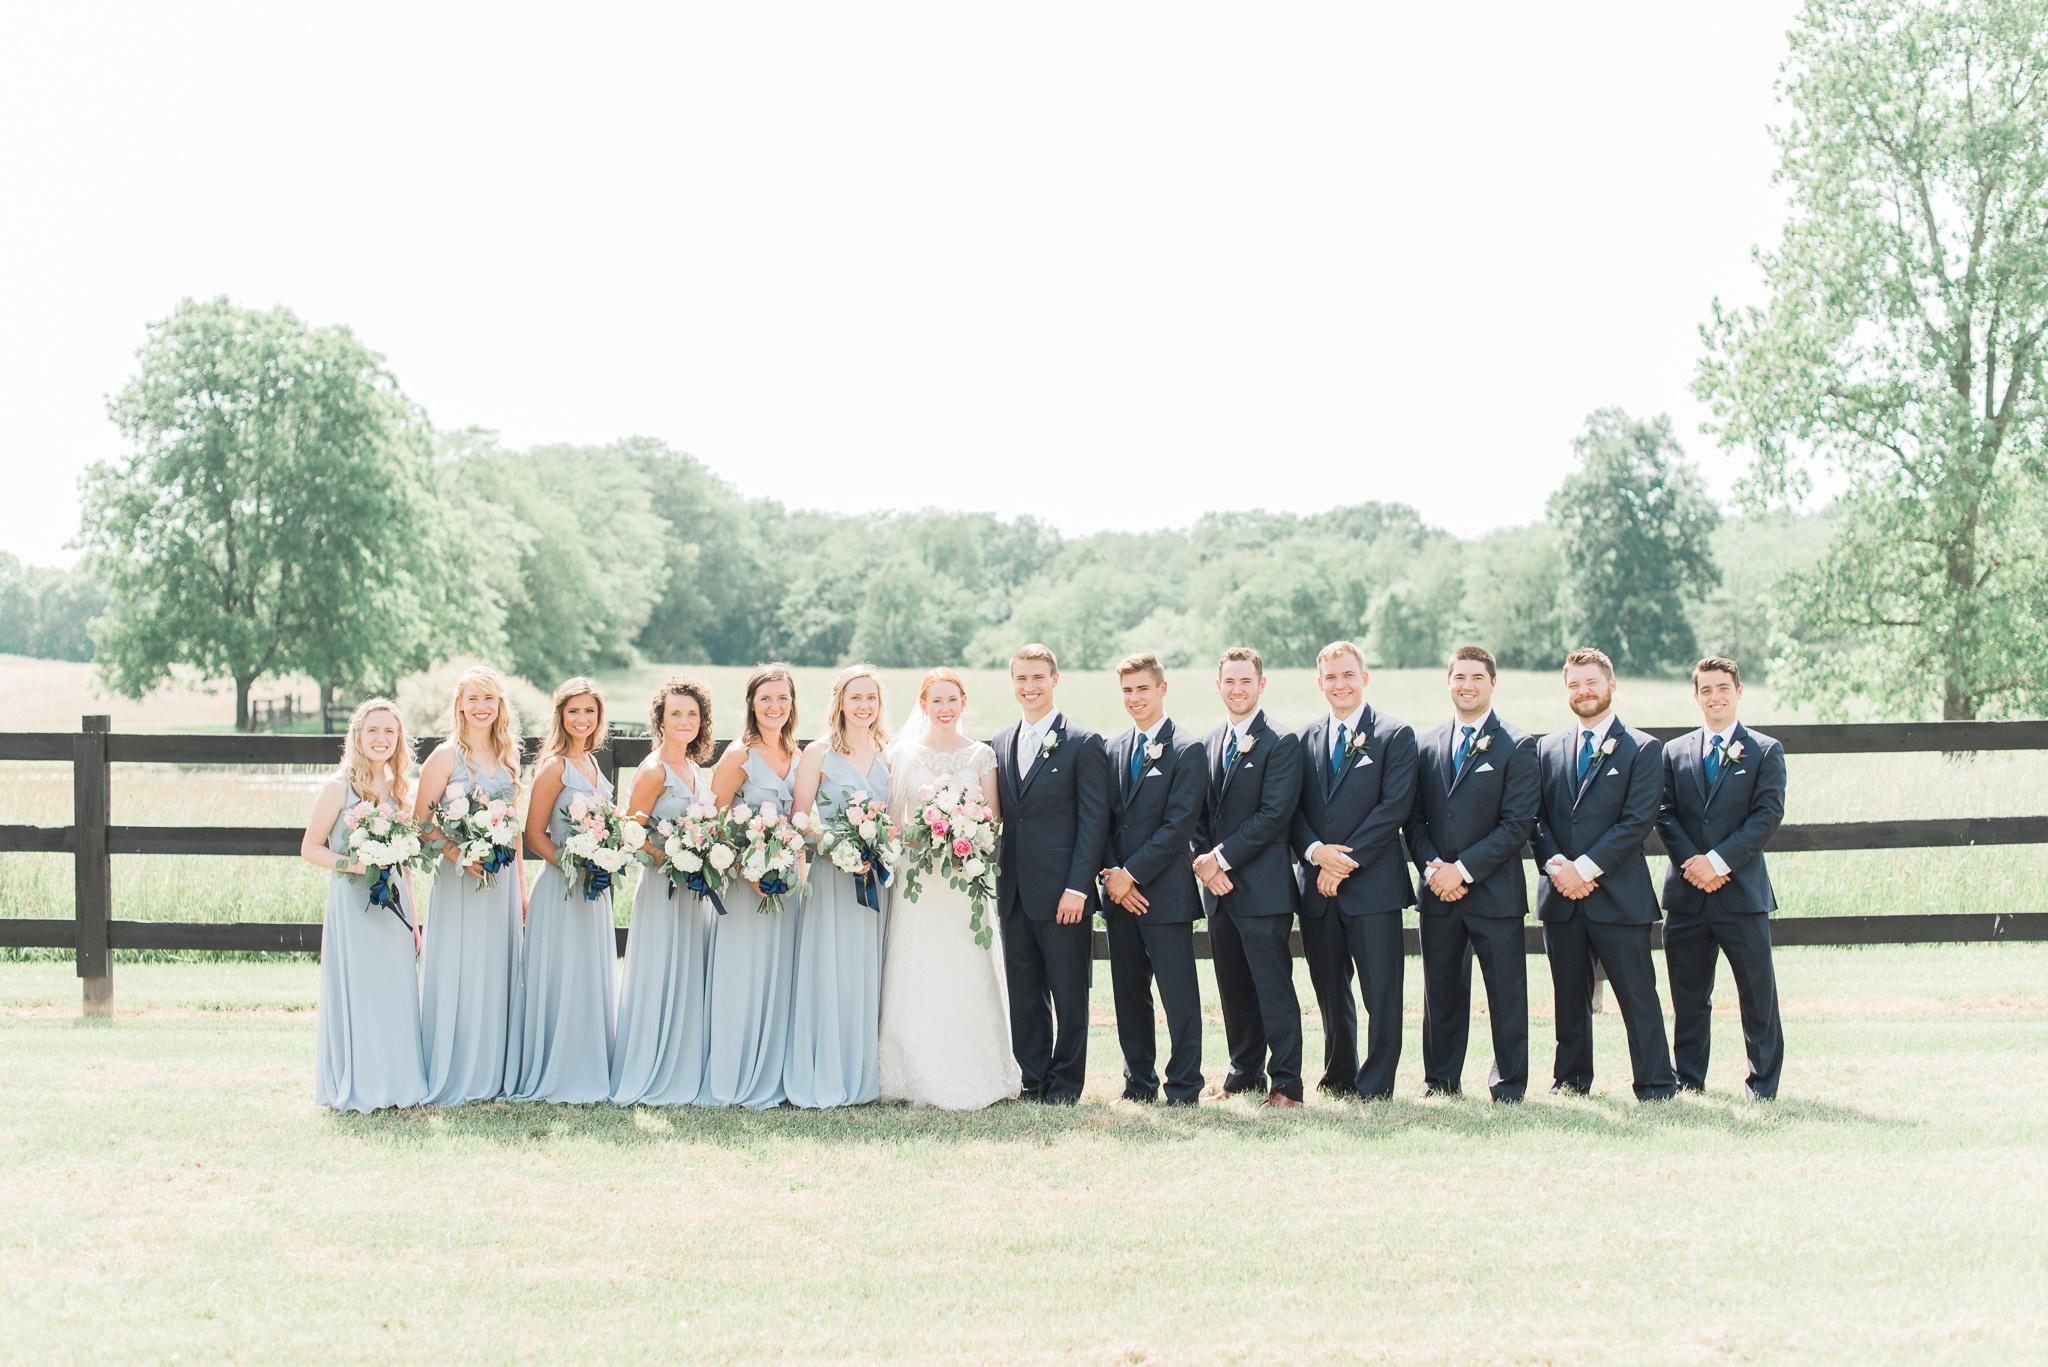 sunbury-ohio-wedding-hannah-johnathan_0065.jpg